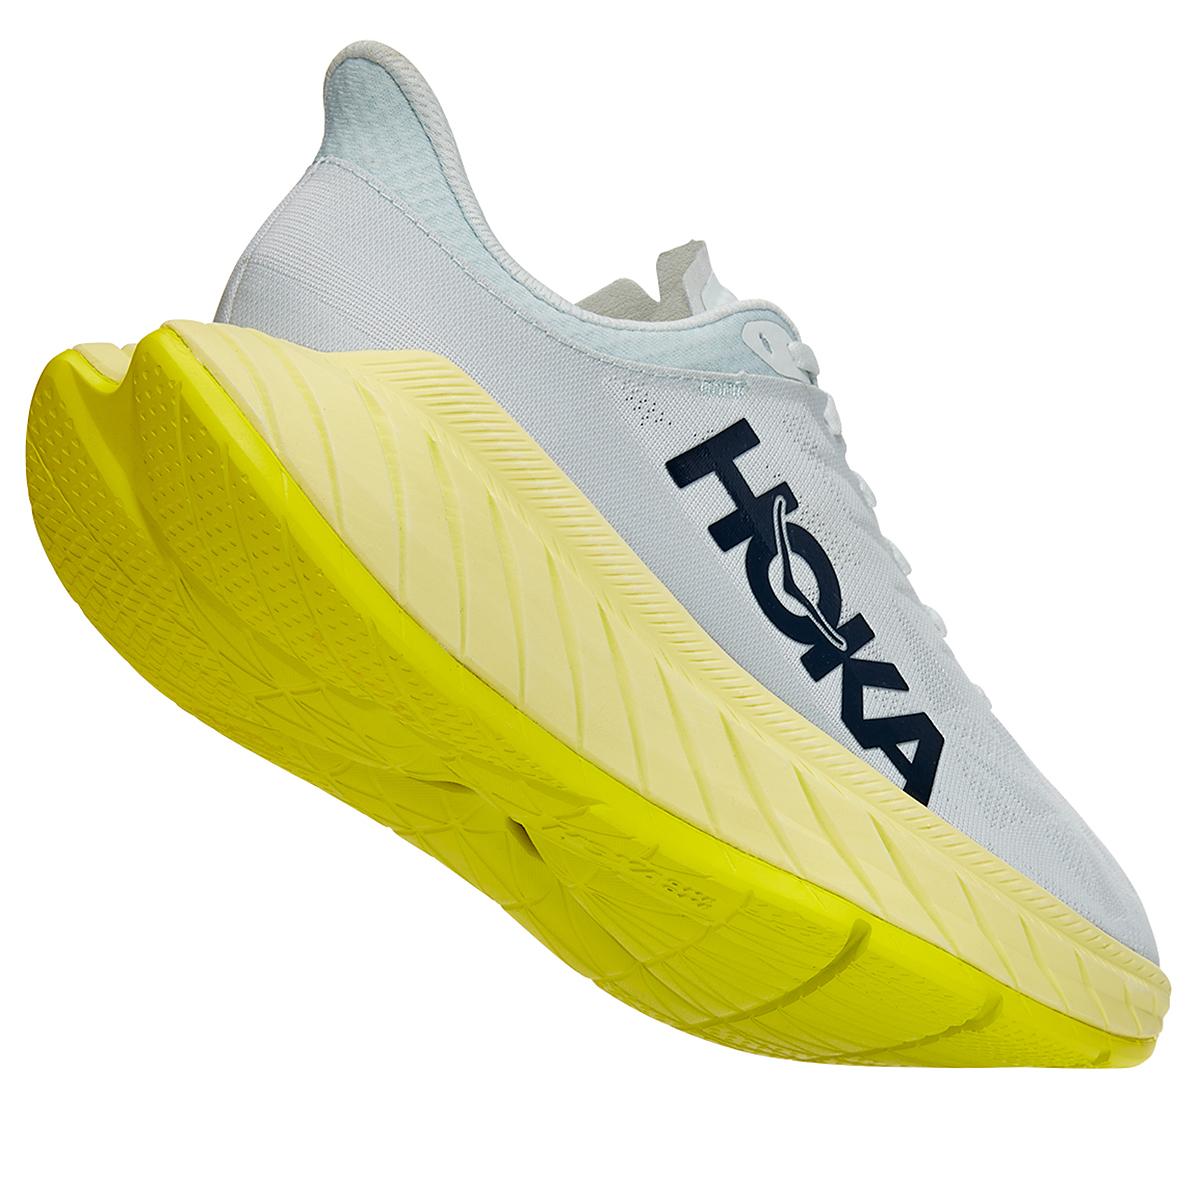 Men's Hoka One One Carbon X 2 Running Shoe - Color: Blue Flower/Luminary Green - Size: 7 - Width: Regular, Blue Flower/Luminary Green, large, image 3